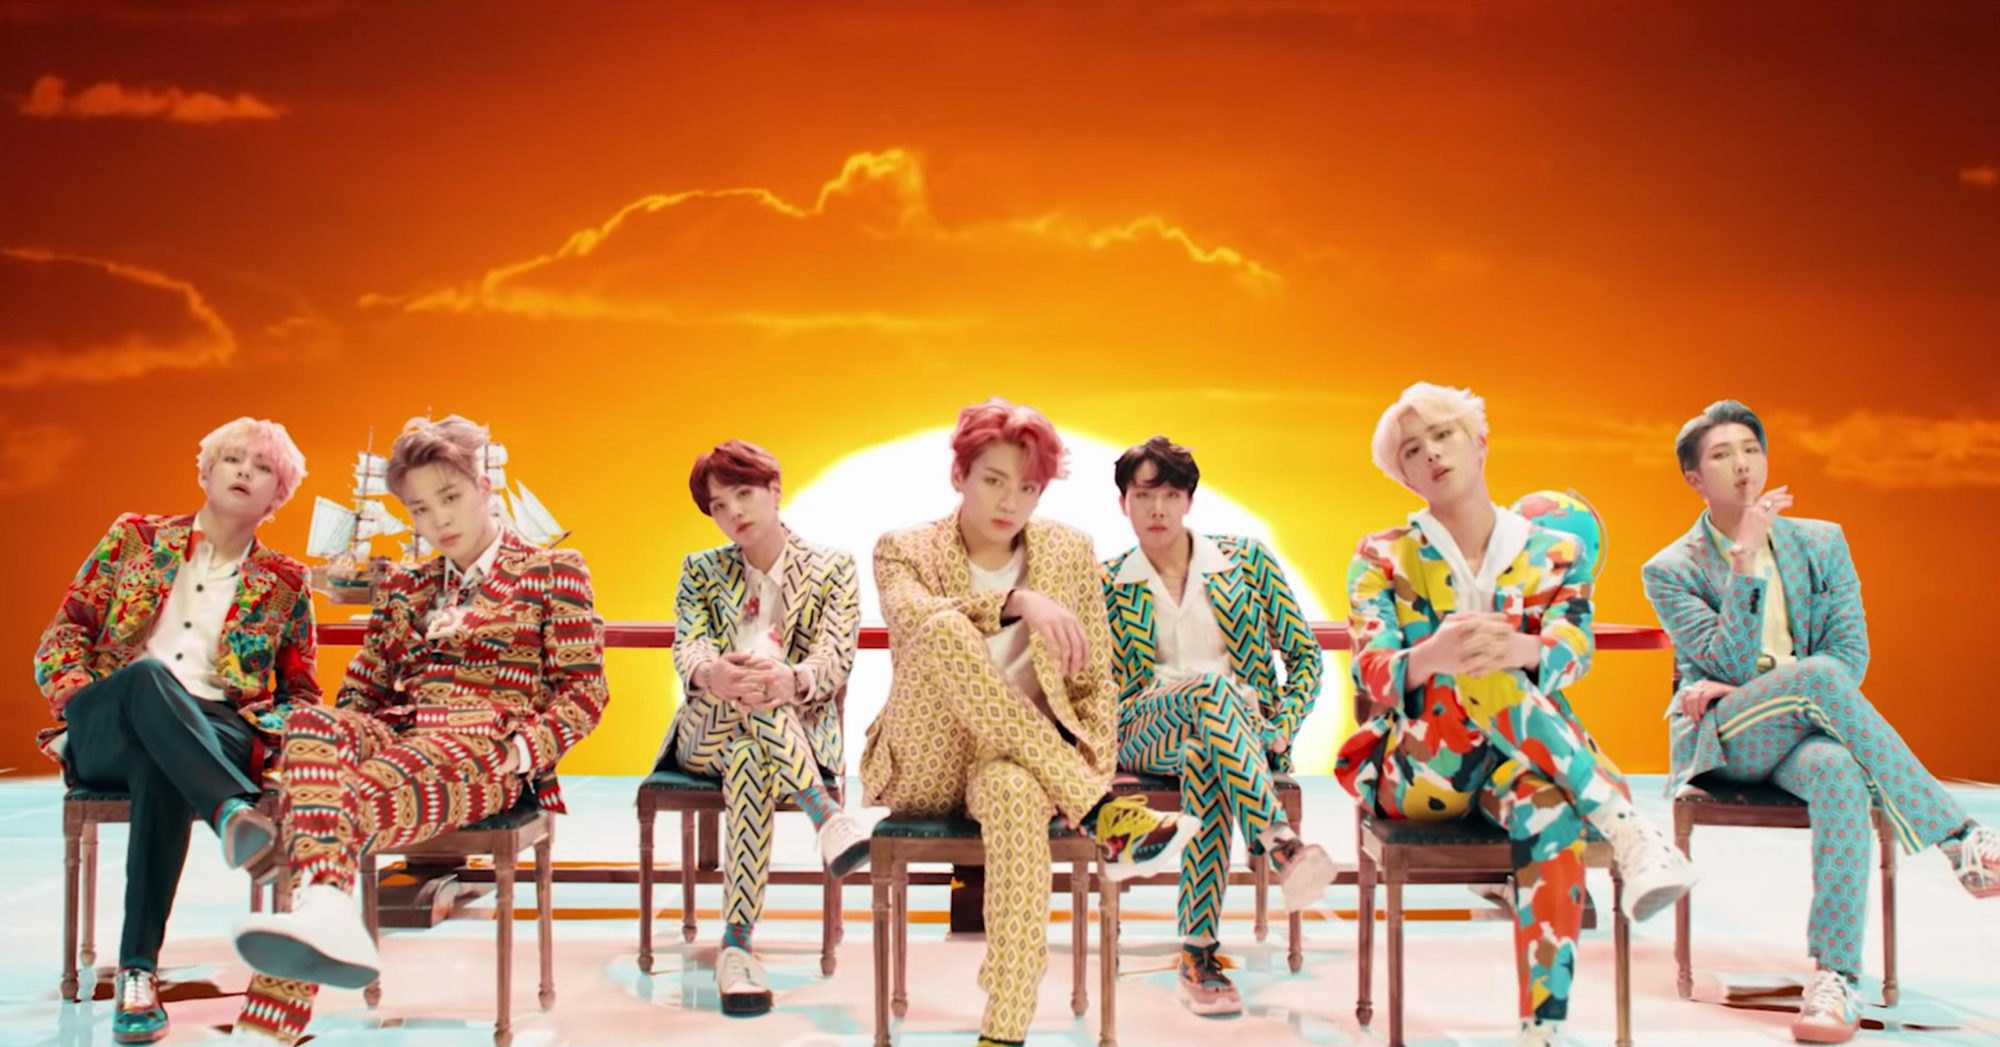 BTS the band (screen grab) https://www.youtube.com/watch?v=pBuZEGYXA6E BTS (방탄소년단) 'IDOL' Official MV CR: BTS/YouTube